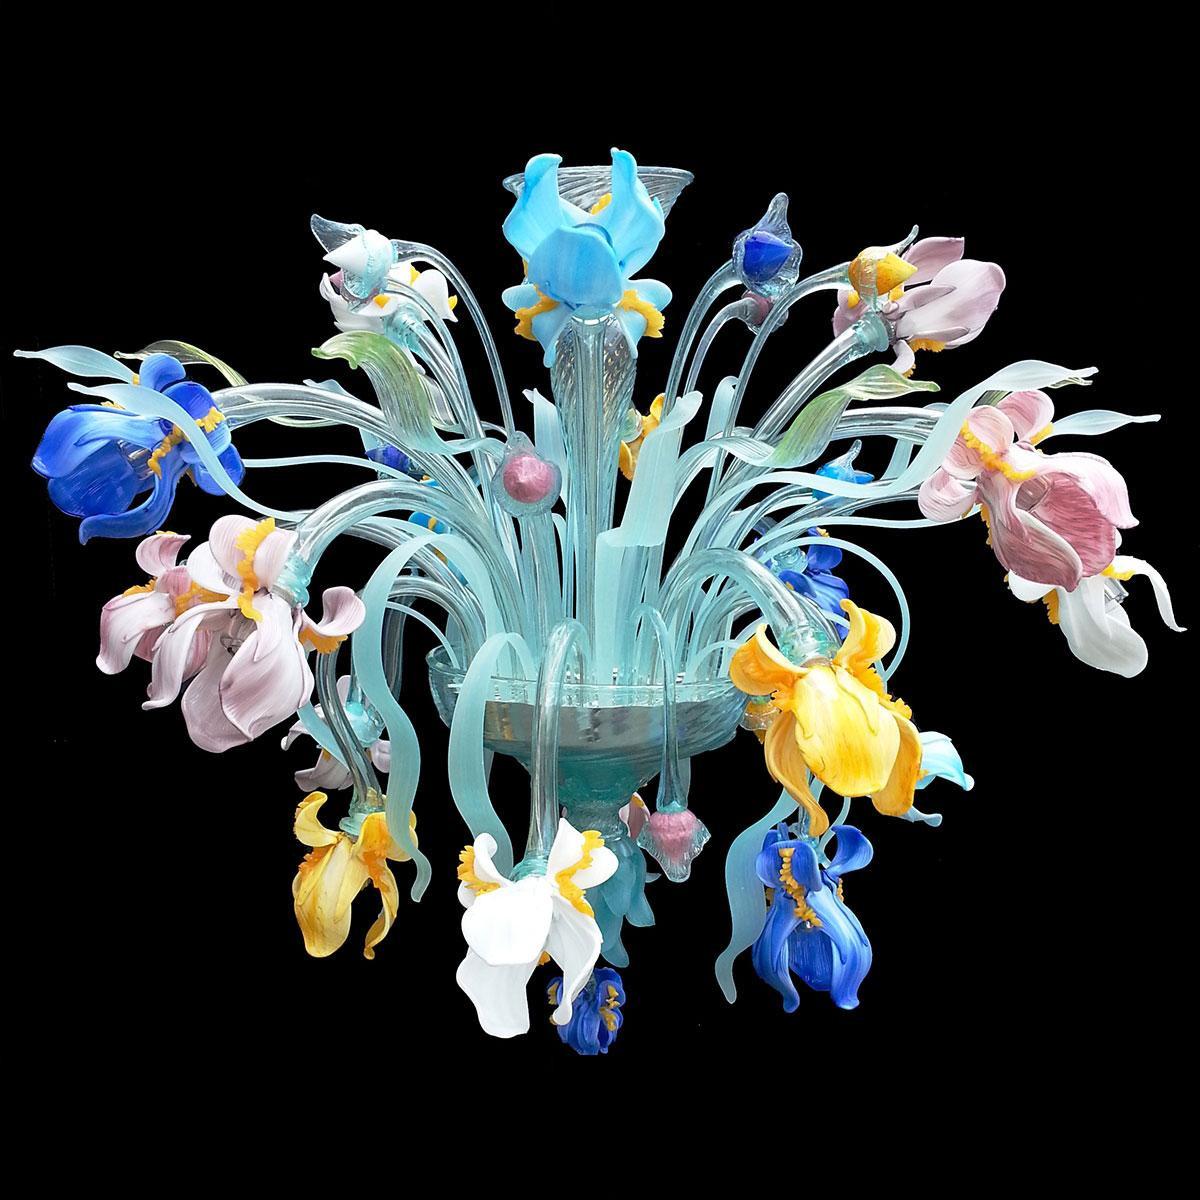 """Iris colorati"" Murano glass ceiling light - 16 lights - multicolor"